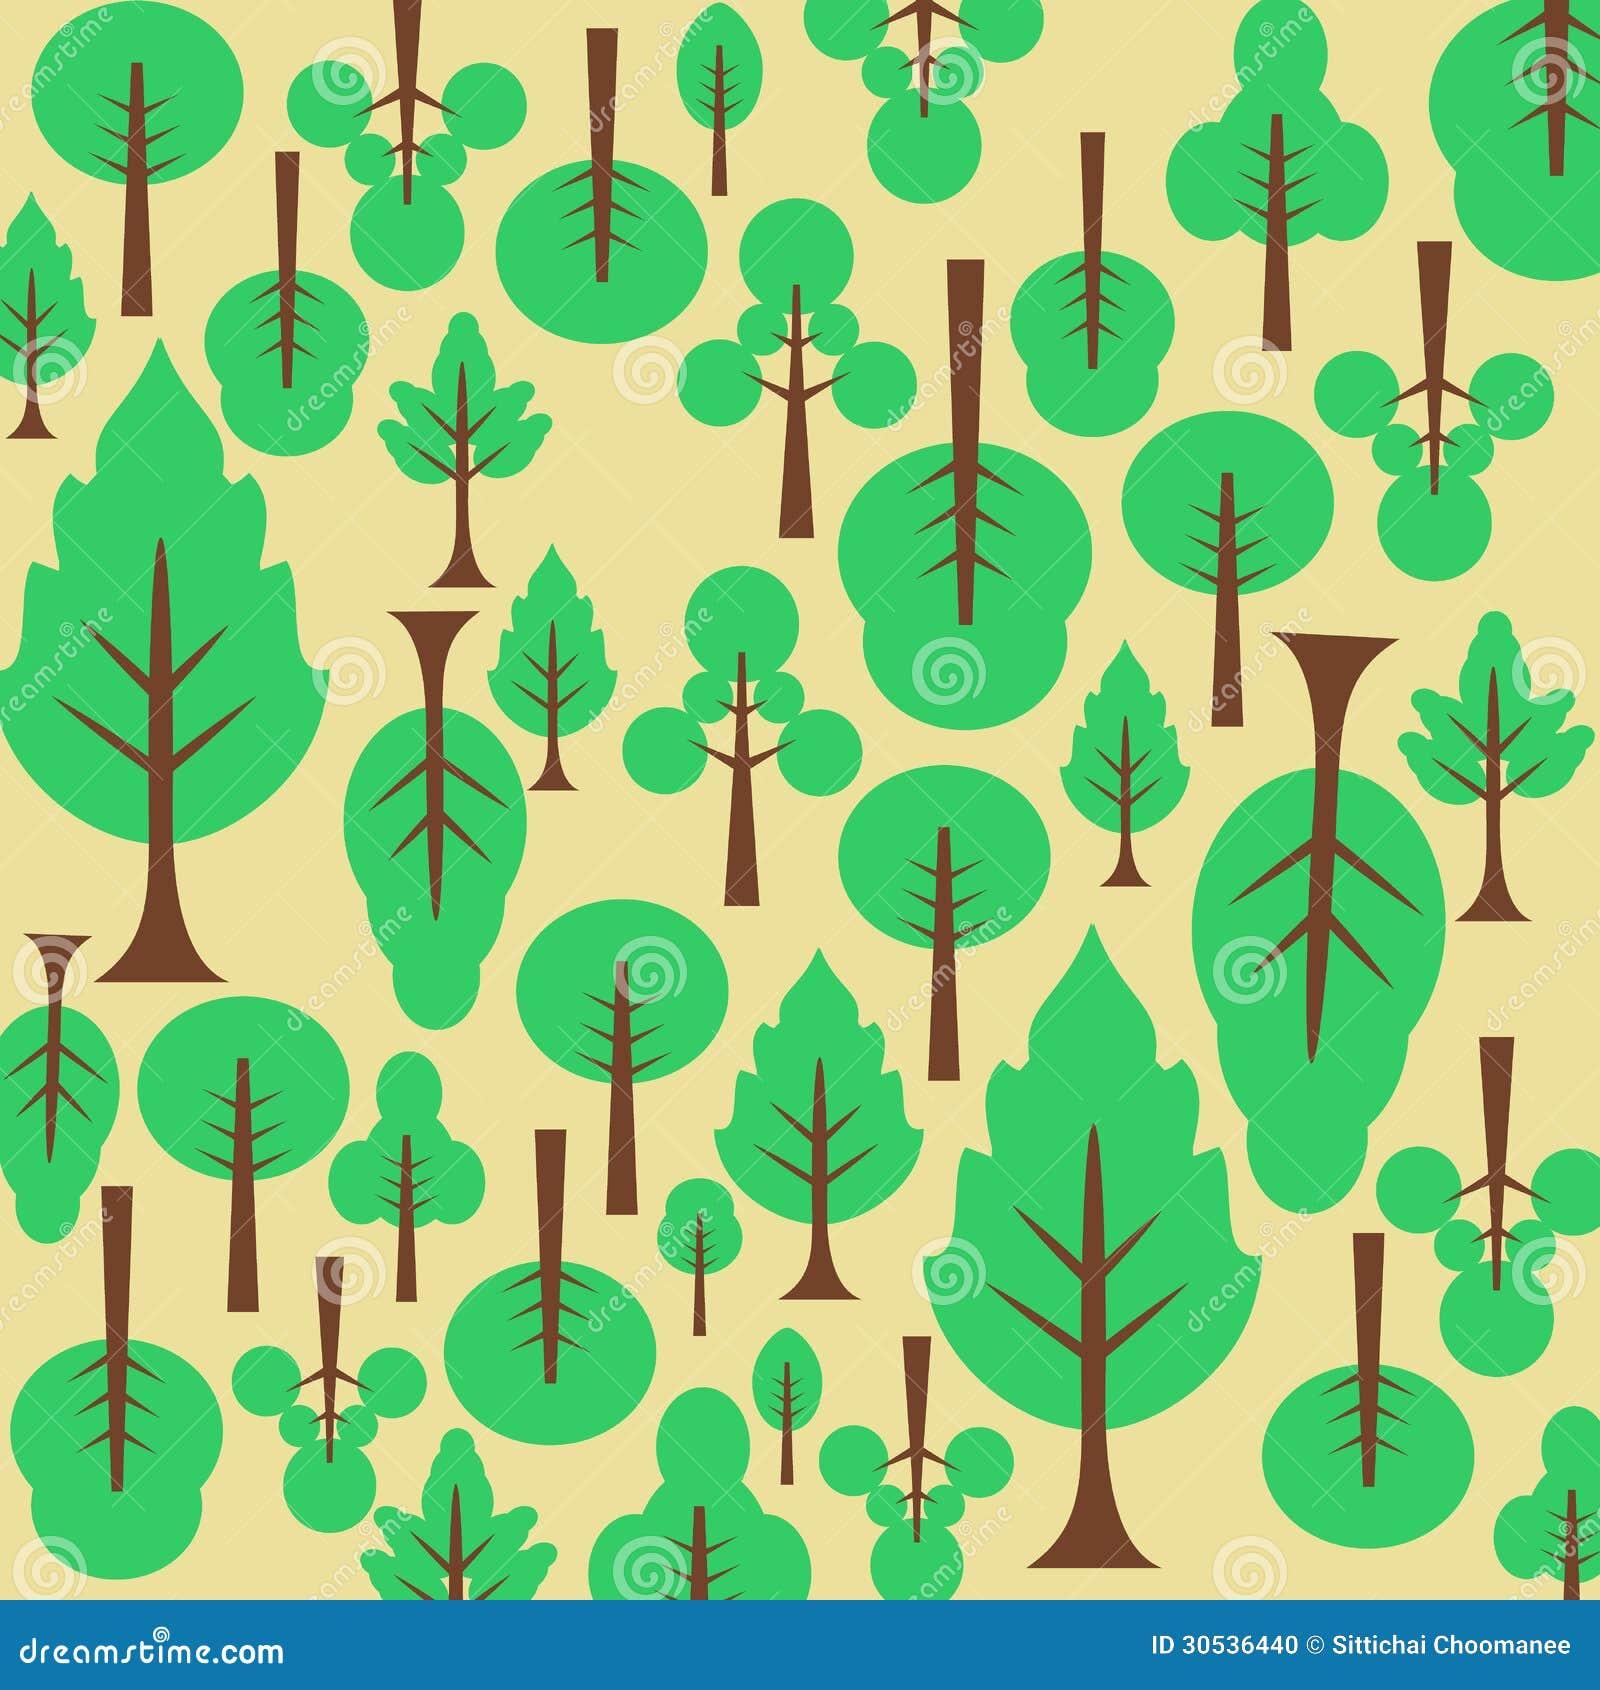 Fabric tree pattern - Background Pattern Tree